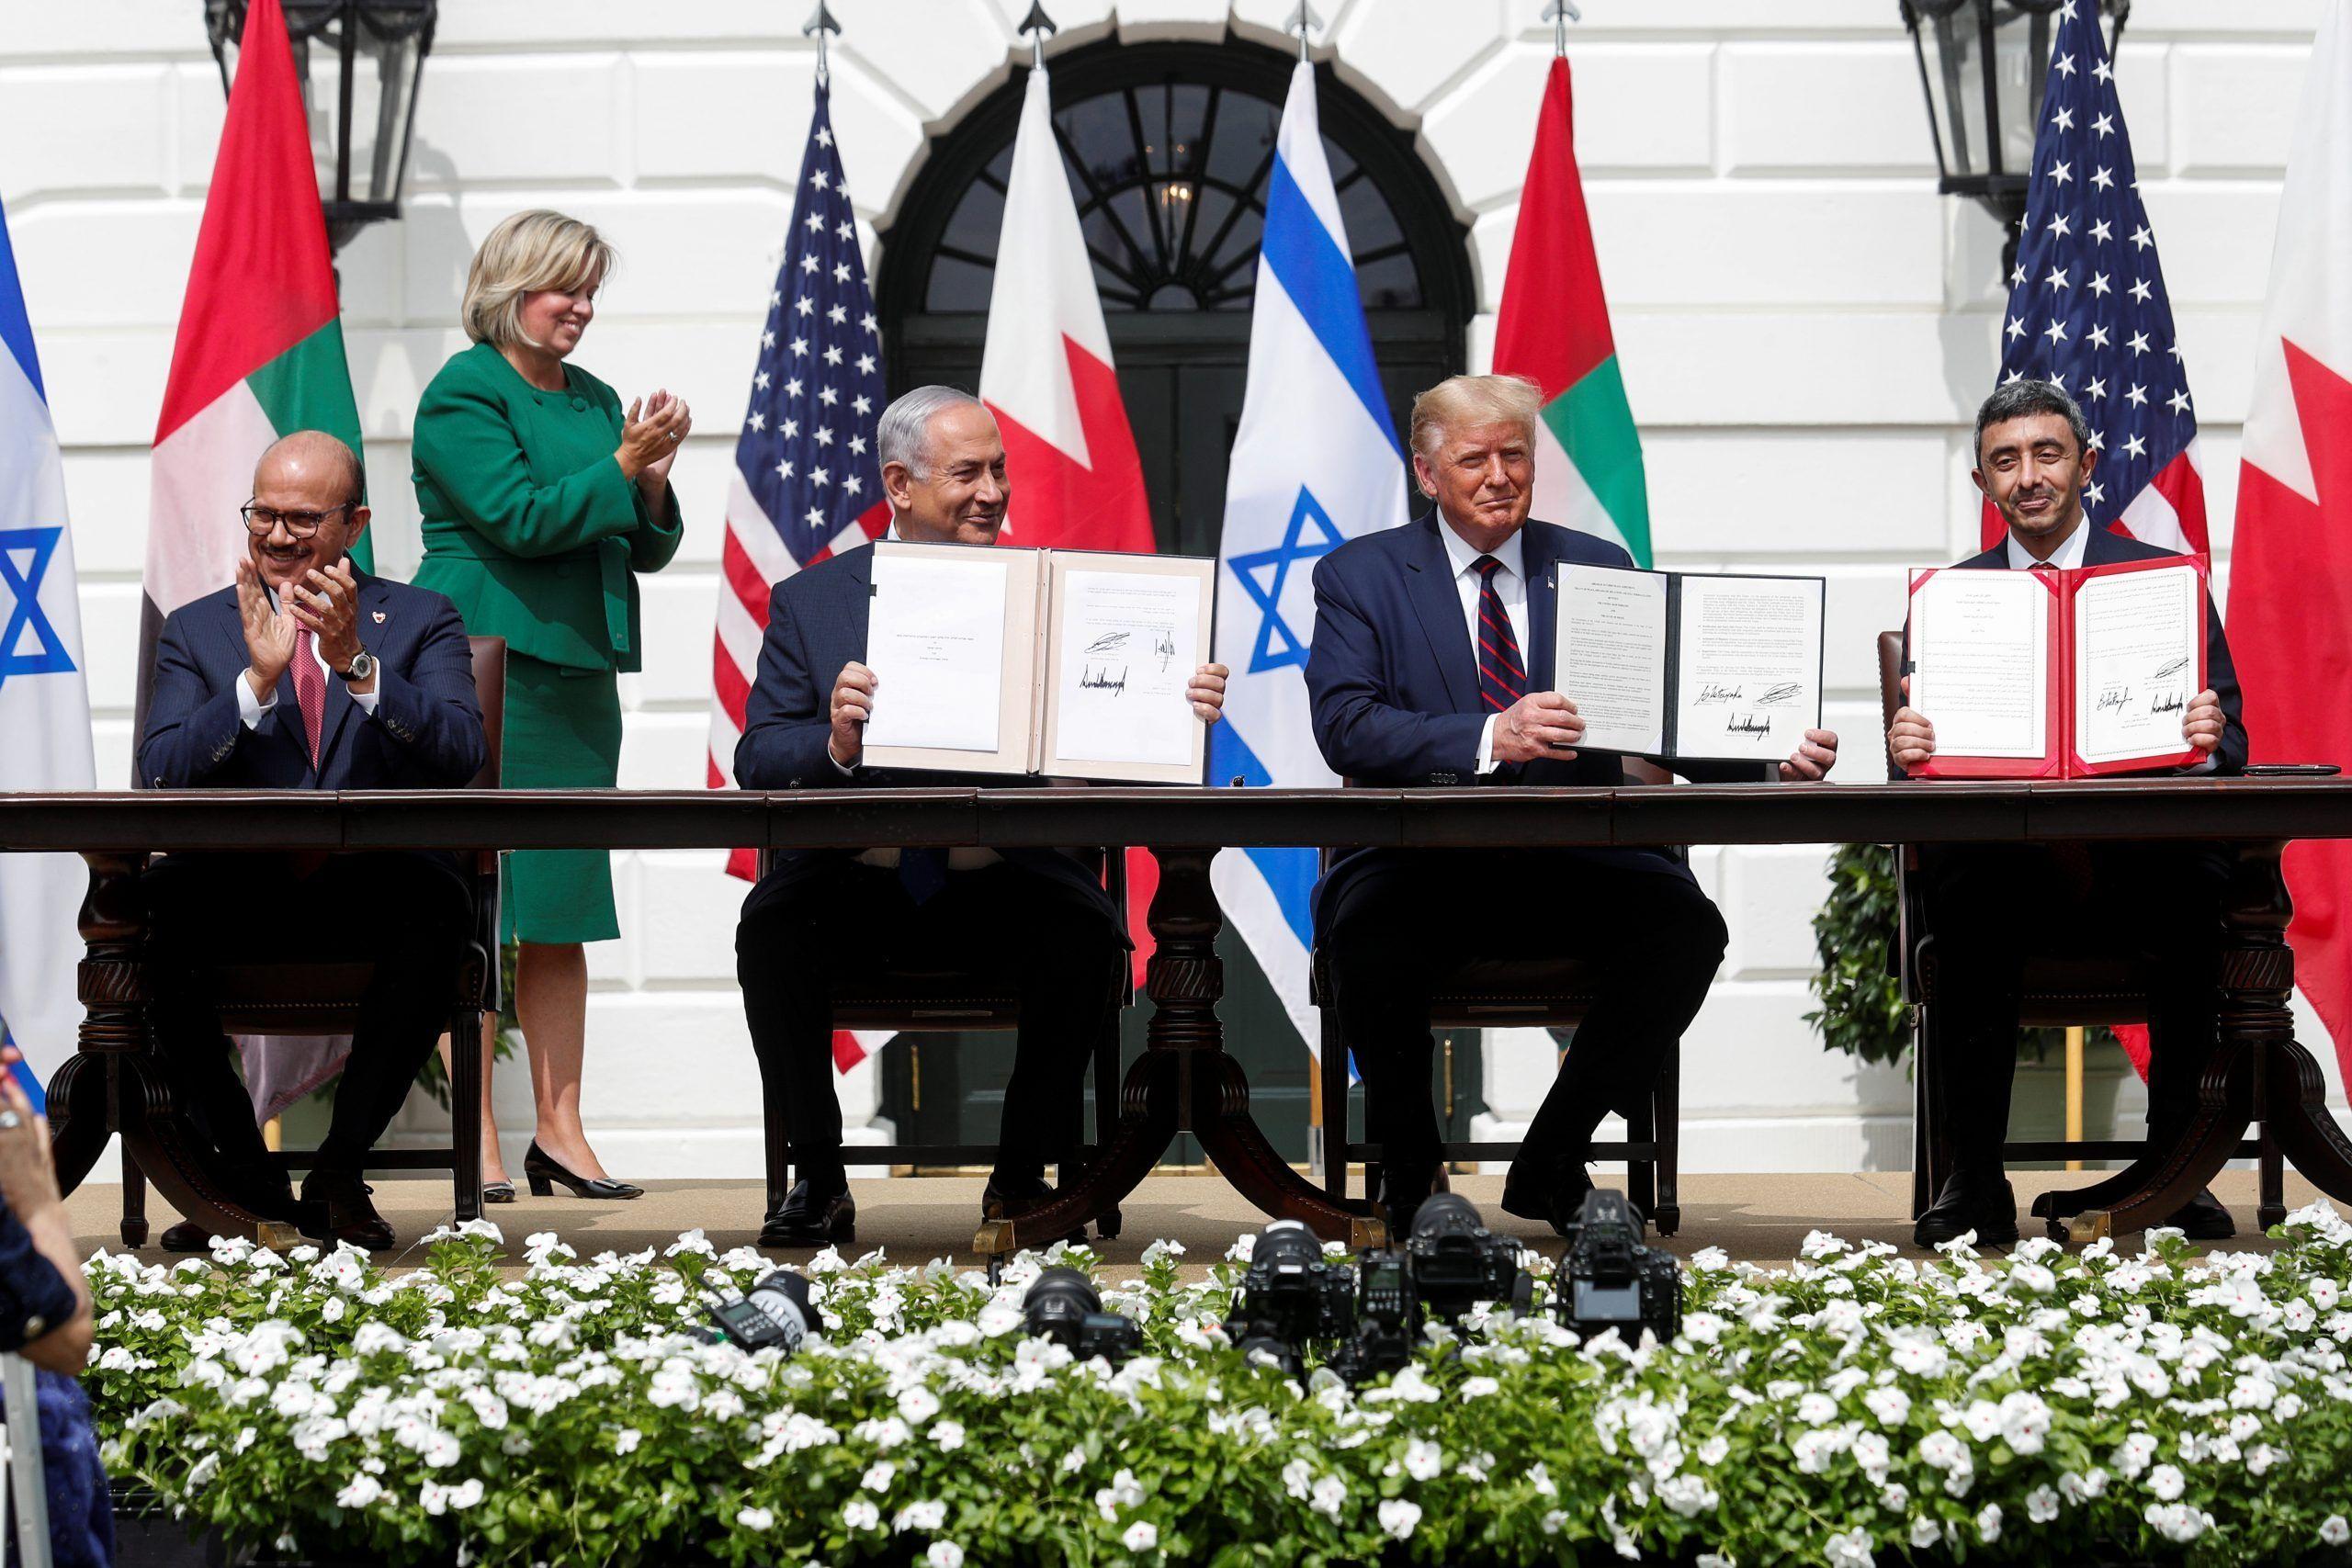 2020-09-15T175652Z_126308353_RC25ZI94HIPB_RTRMADP_3_ISRAEL-GULF-USA-scaled